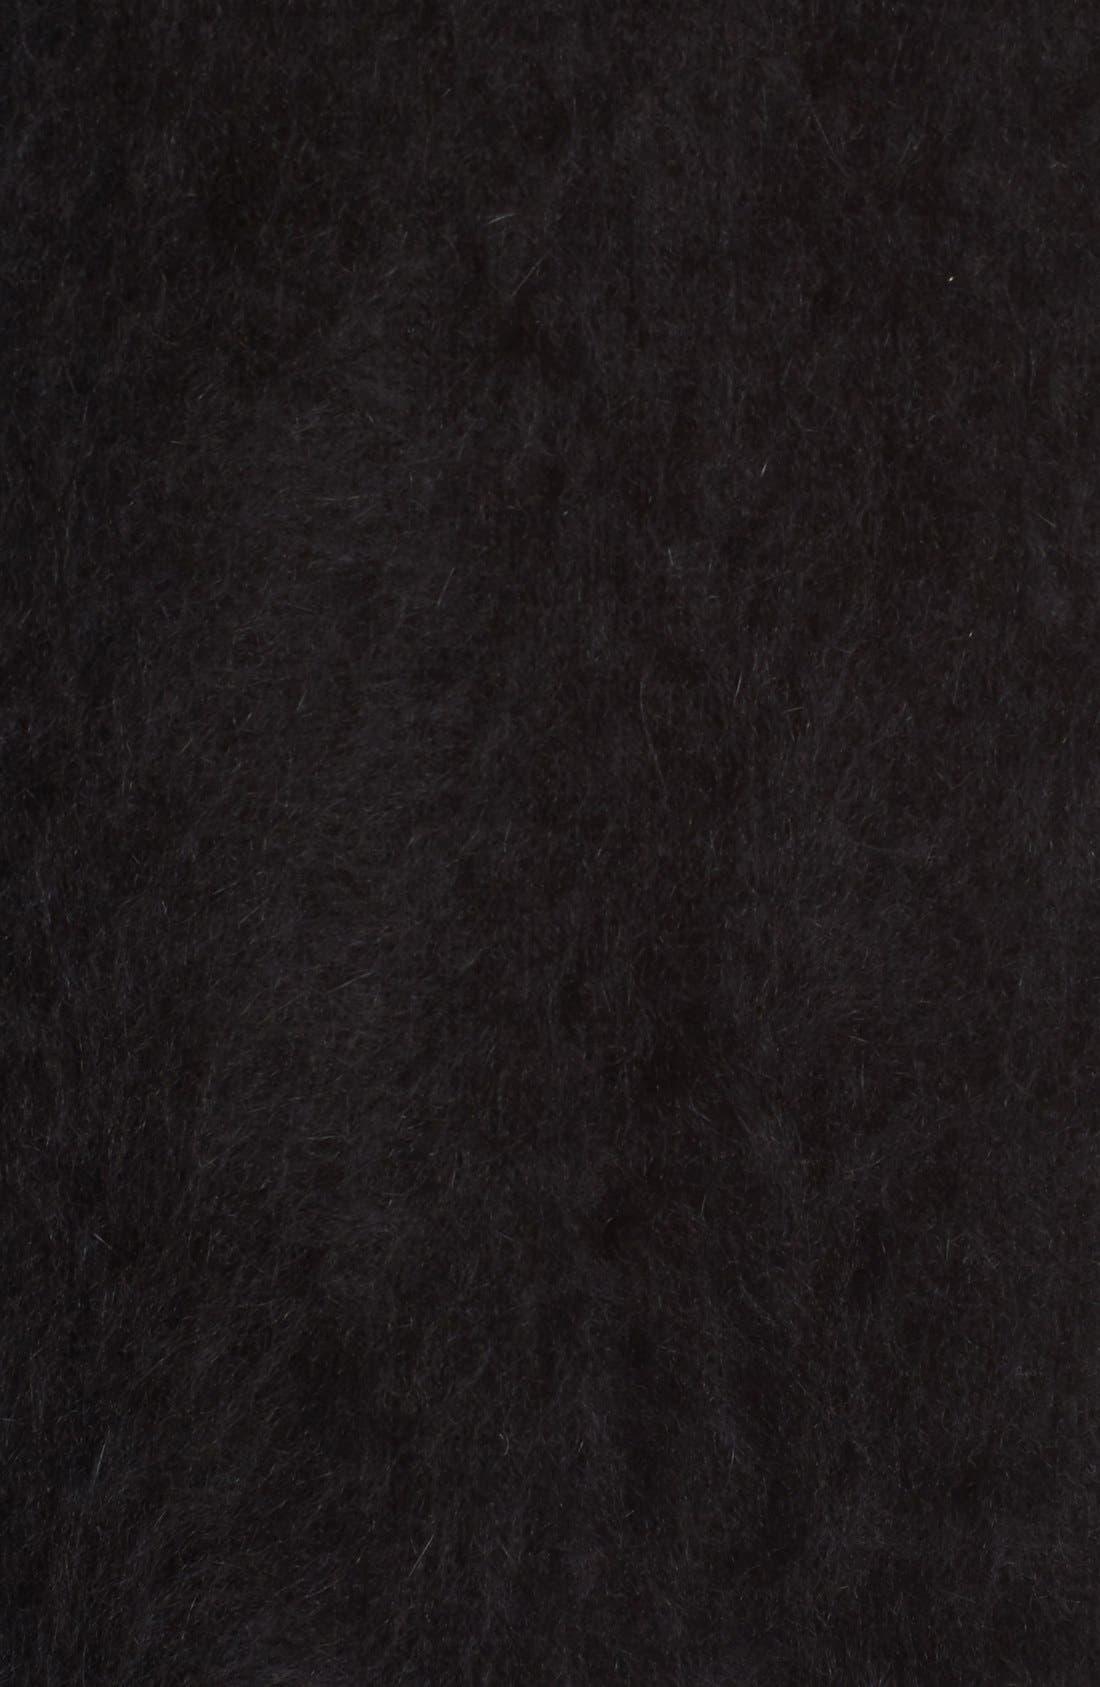 Alternate Image 3  - Alexander Wang 'Tender' Embroidered Wool Blend Sweater